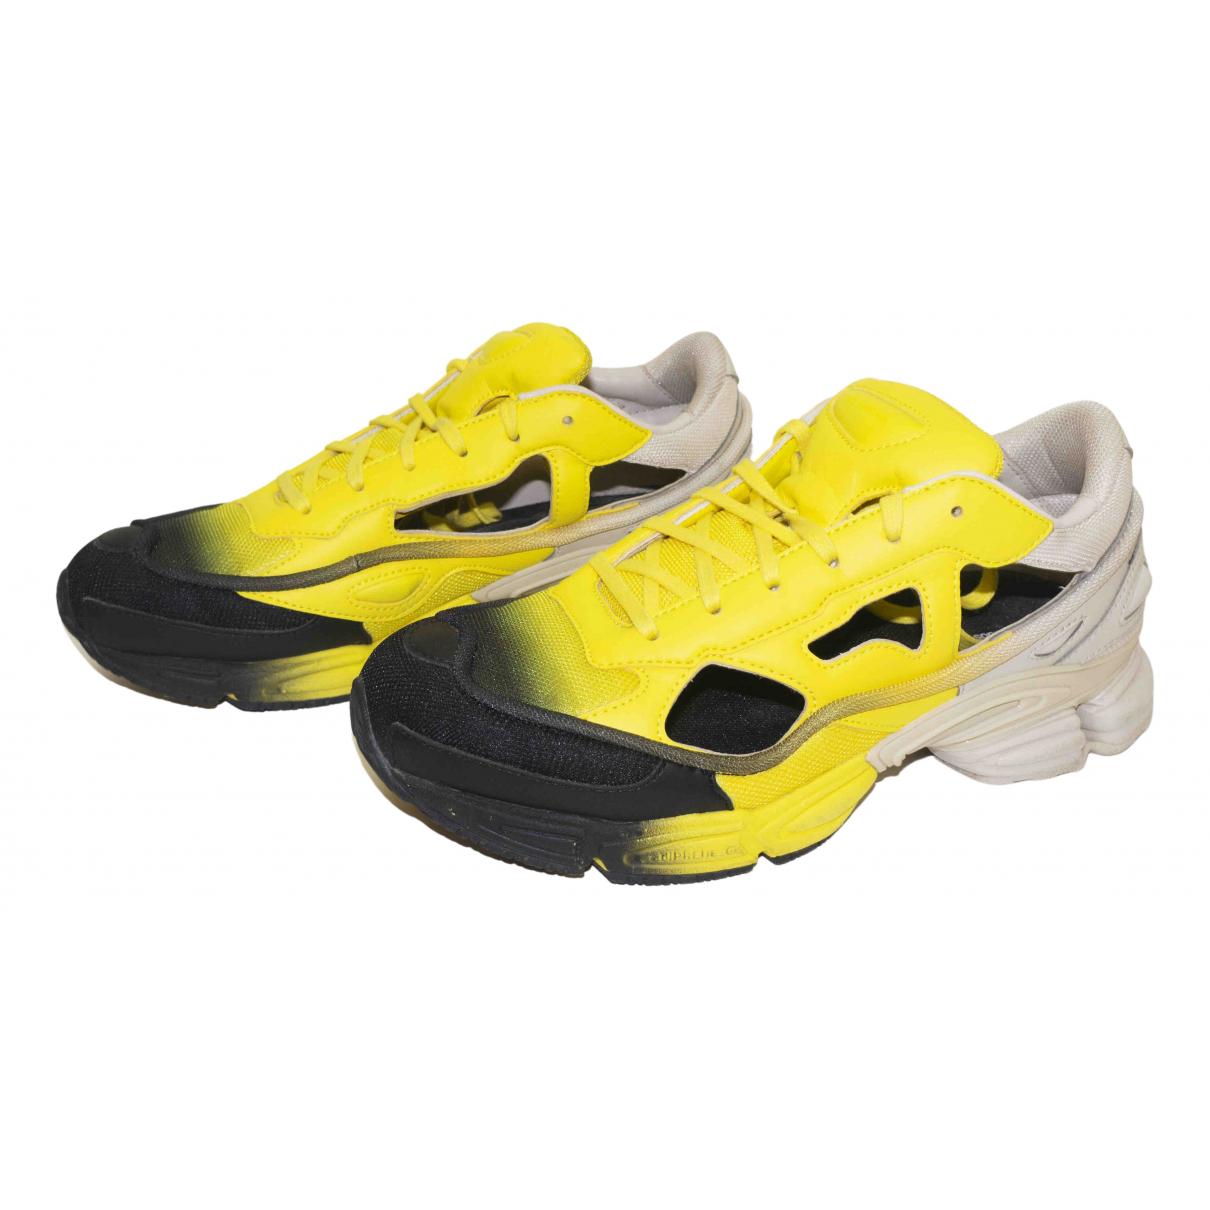 Adidas X Raf Simons - Baskets Replicant Owzeego pour homme en cuir - jaune